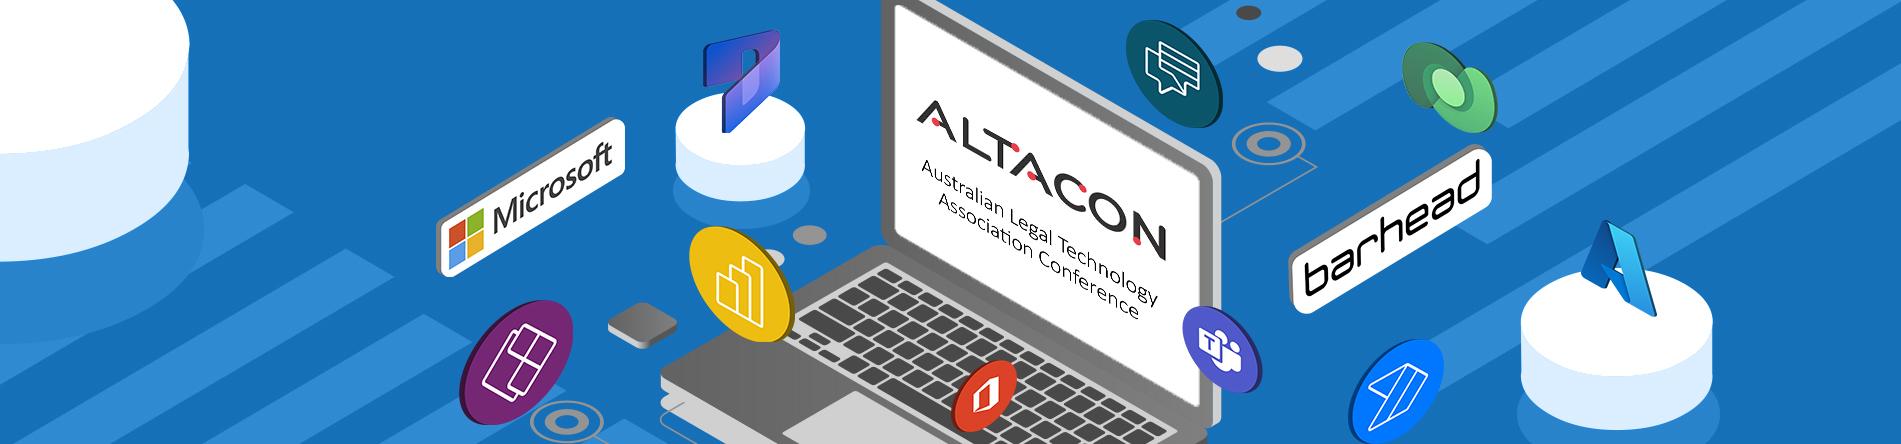 Altacon 2021